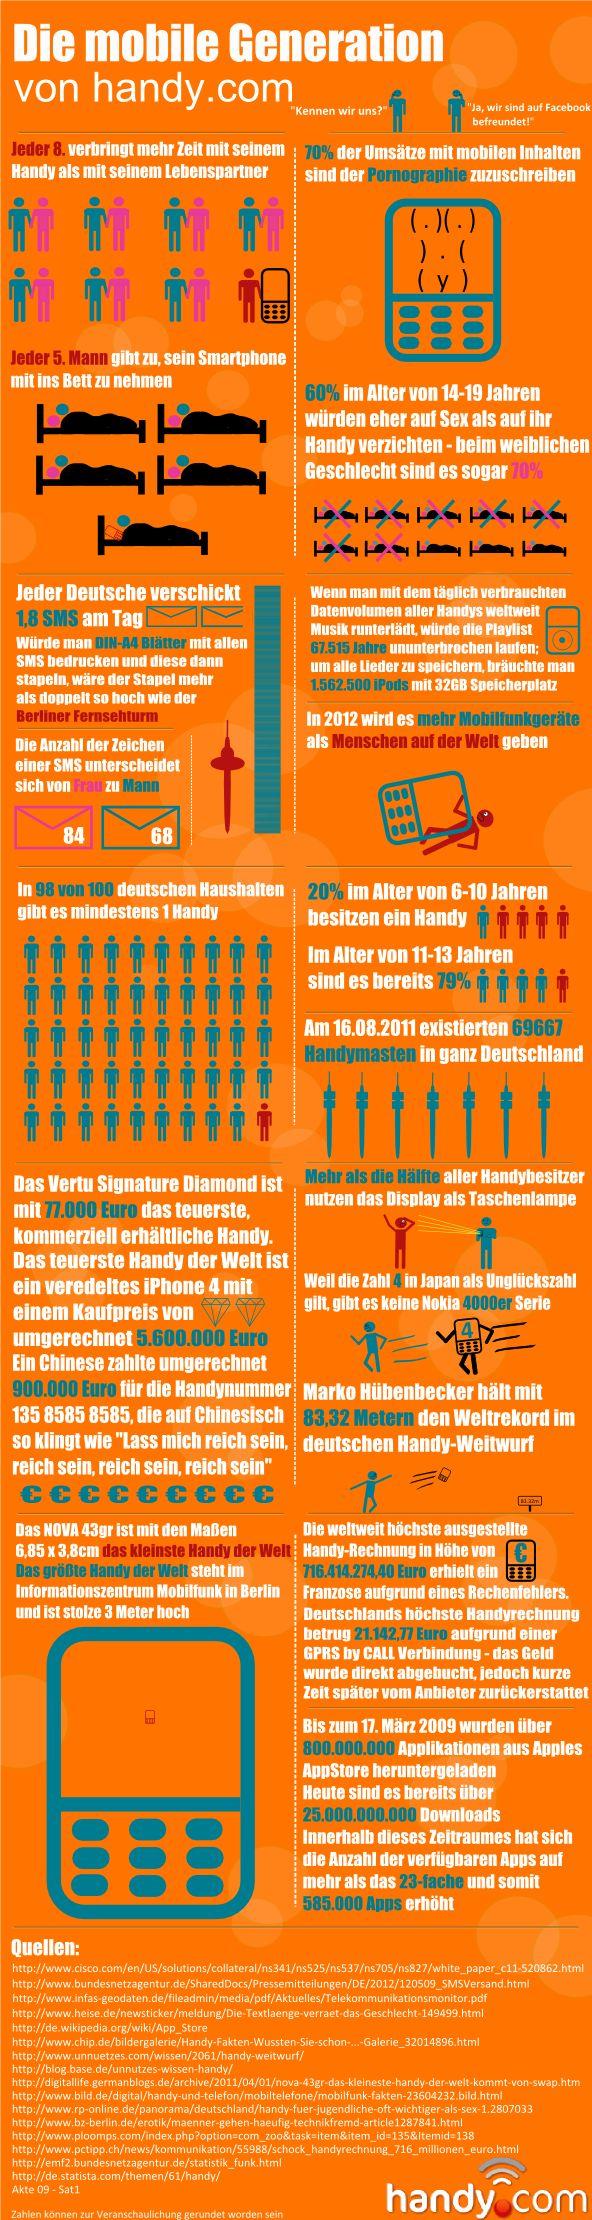 151 best Learning German images on Pinterest | Learn german, German ...